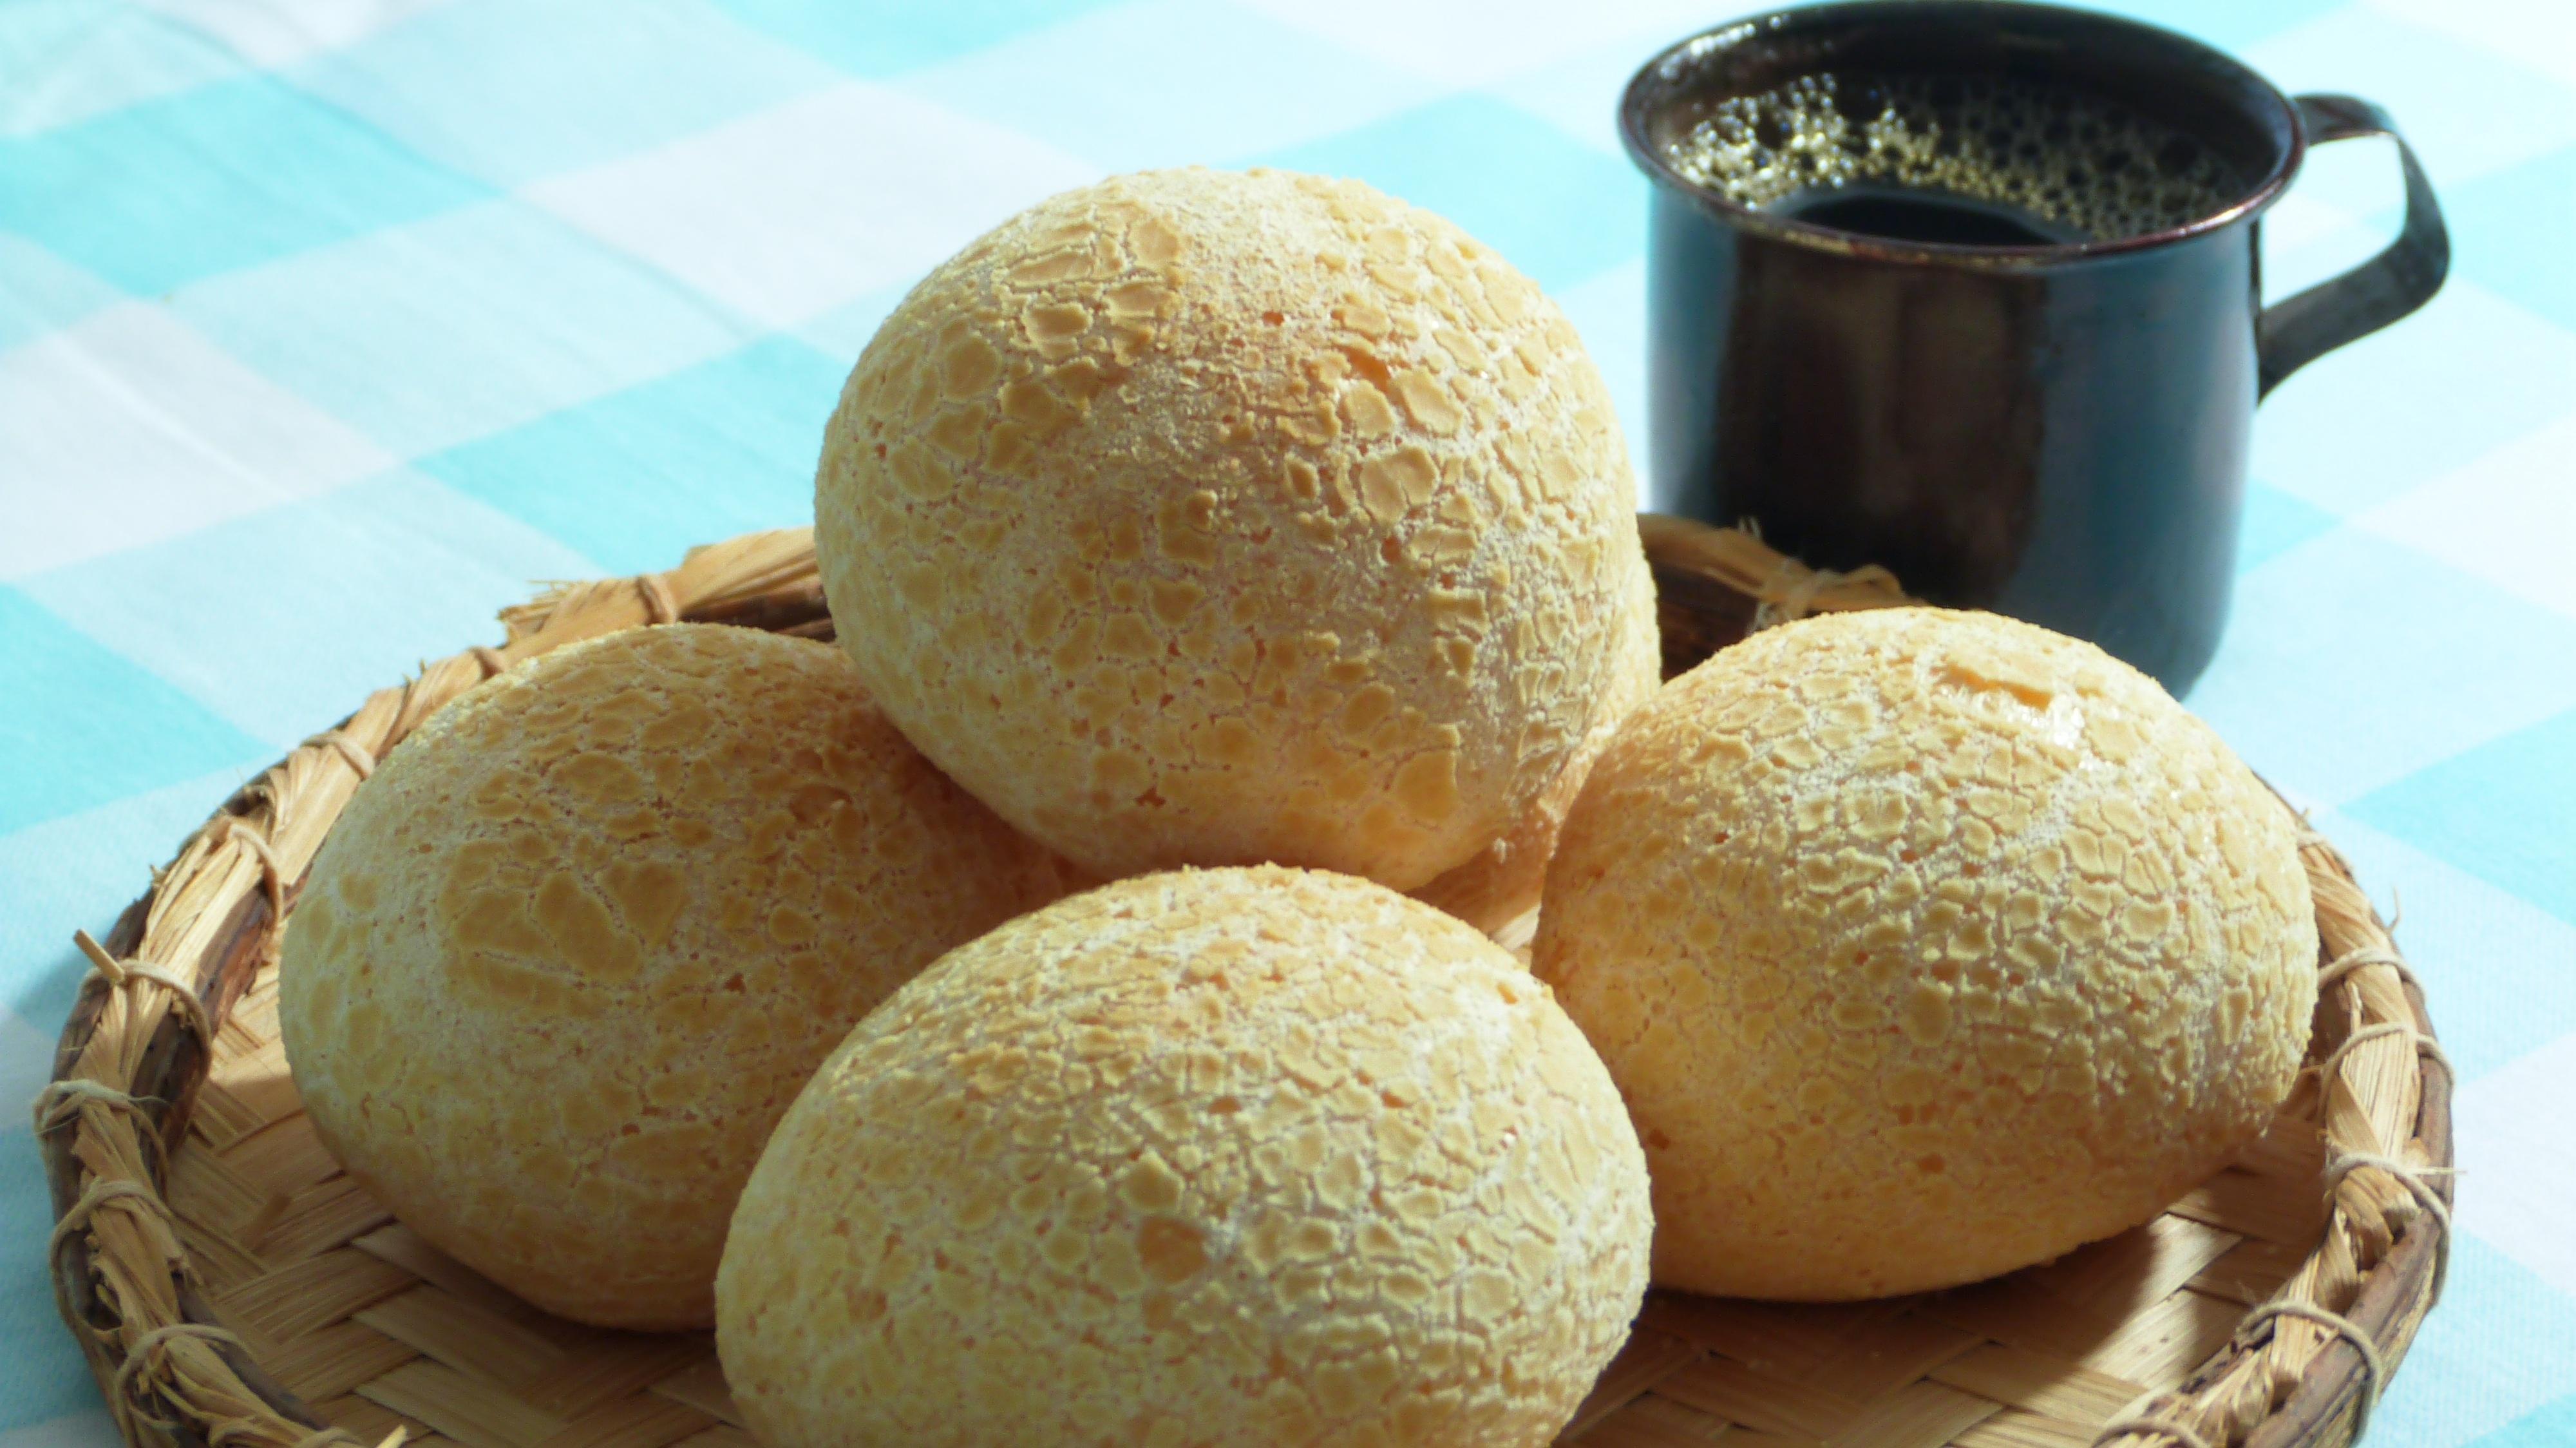 coffee-dish-food-baking-cuisine-cake-664397-pxhere.com